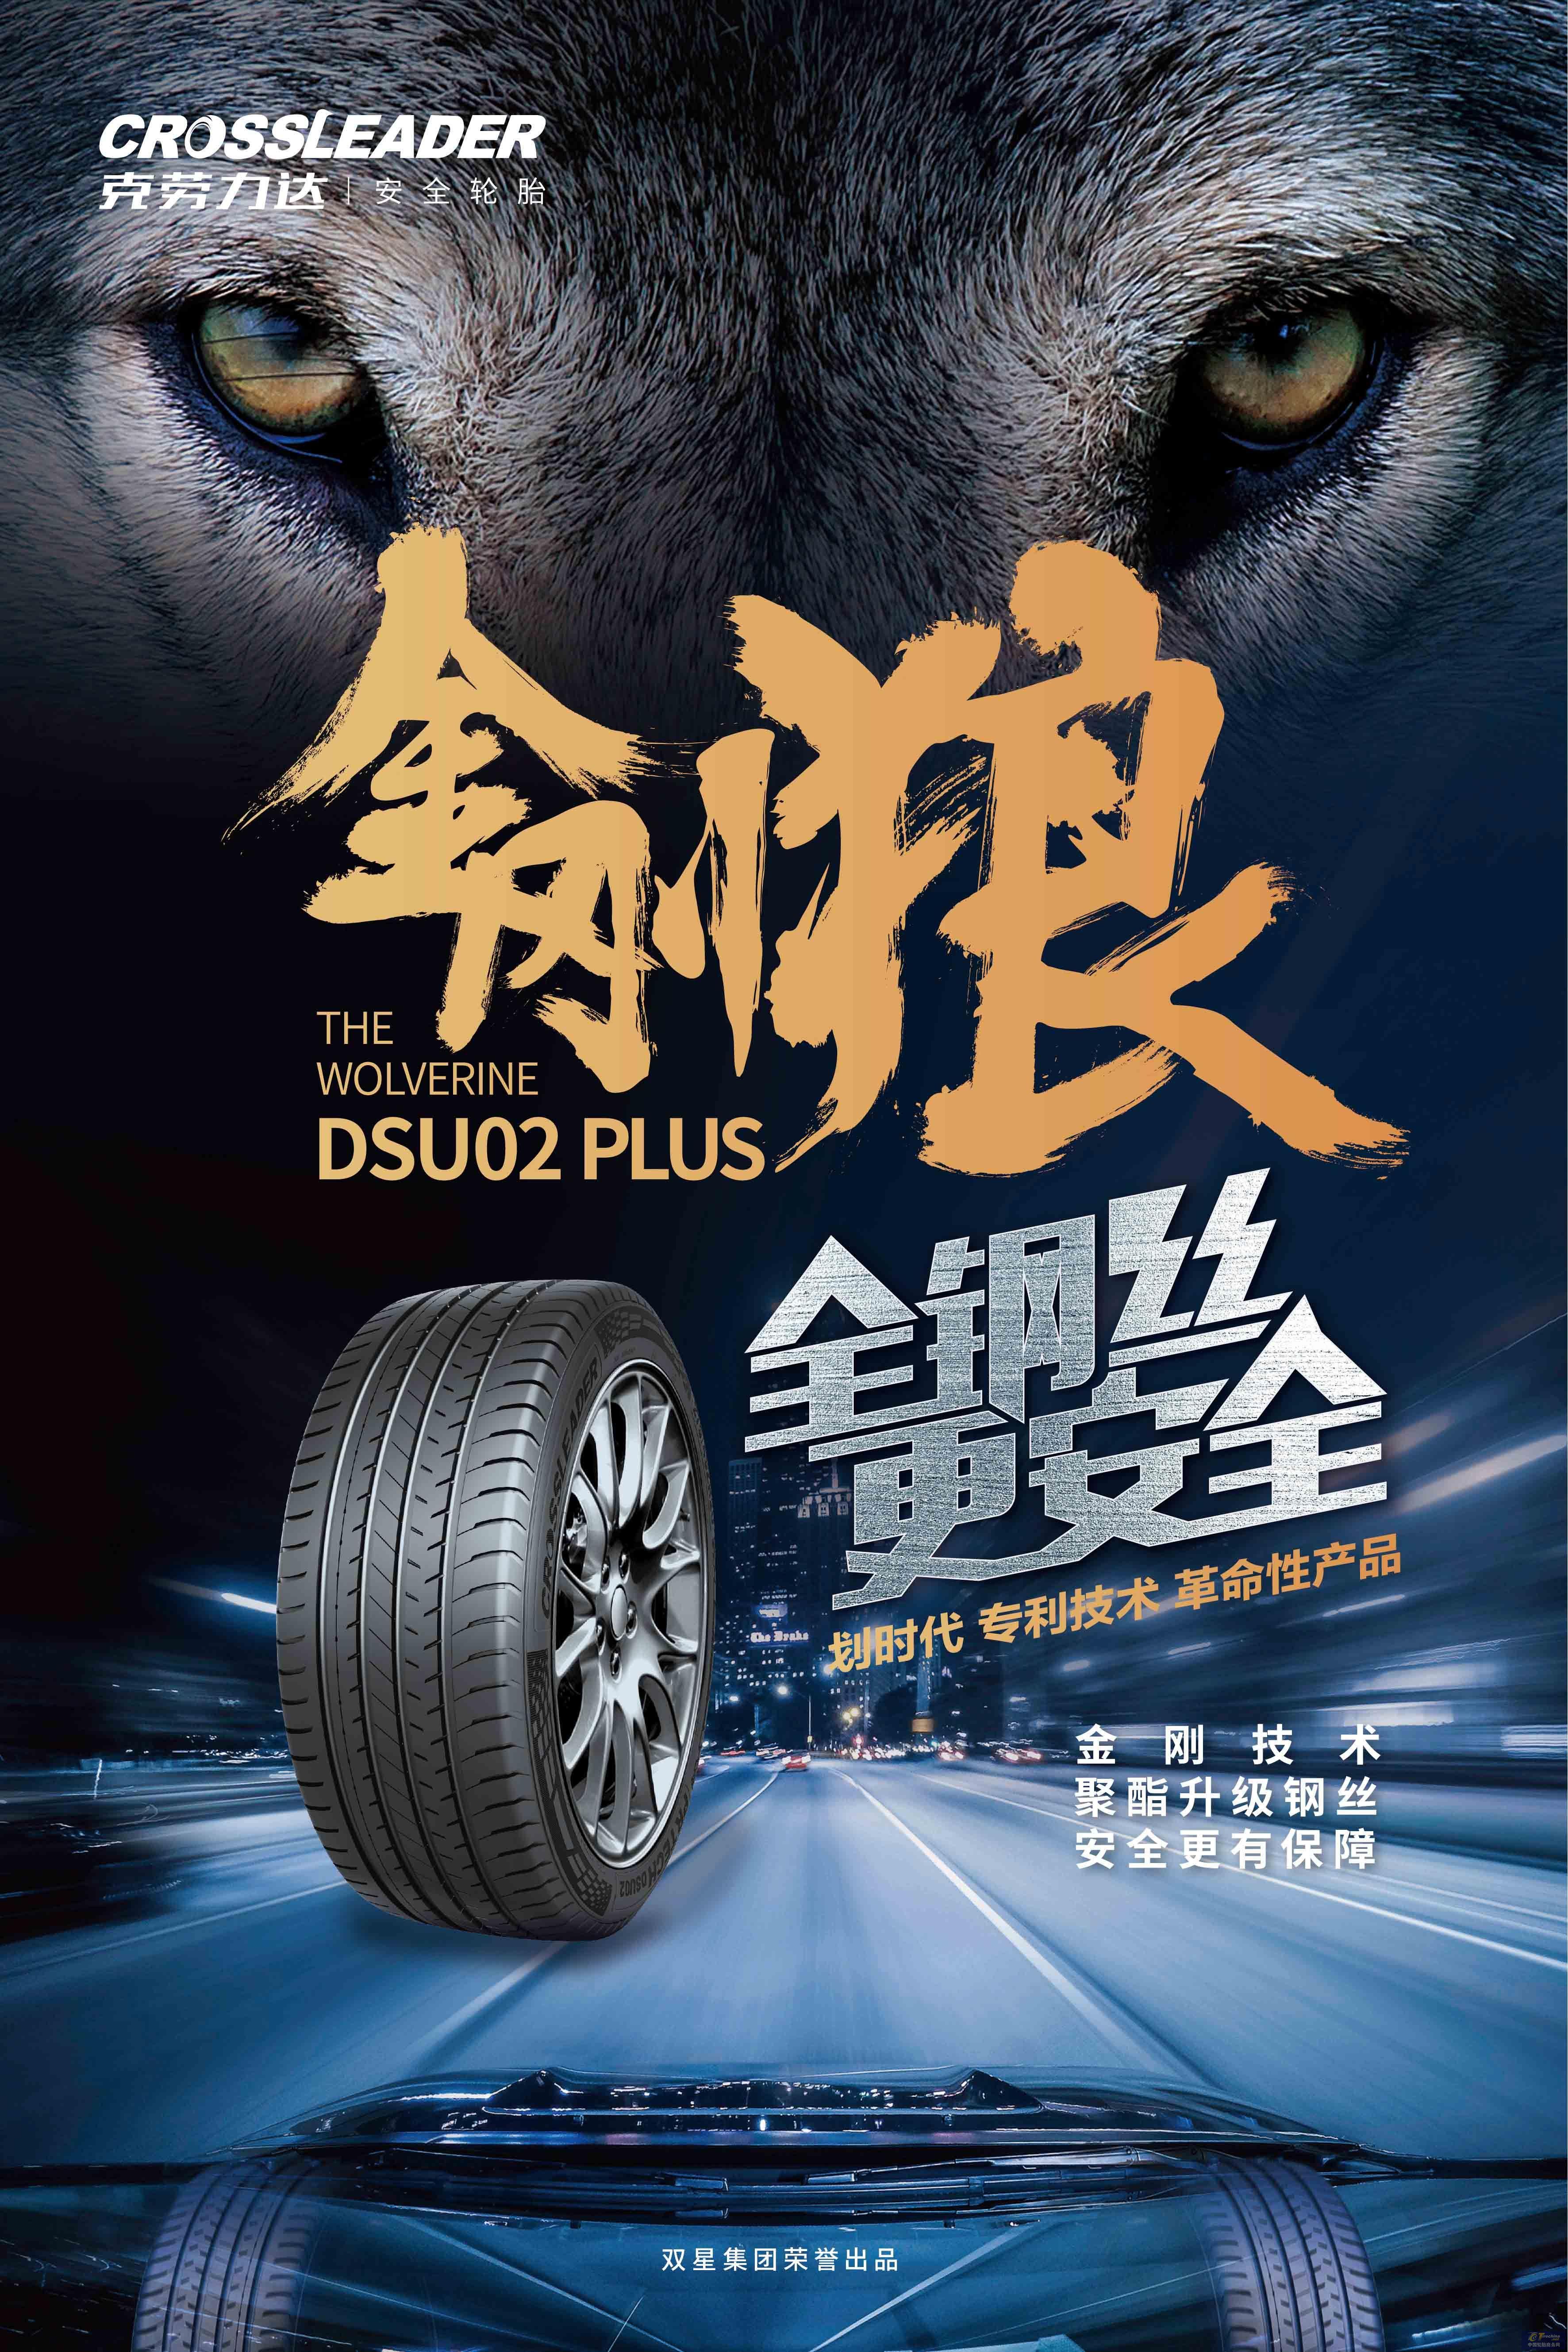 CROSSLEADER安全轮胎 安全品质的捍卫者